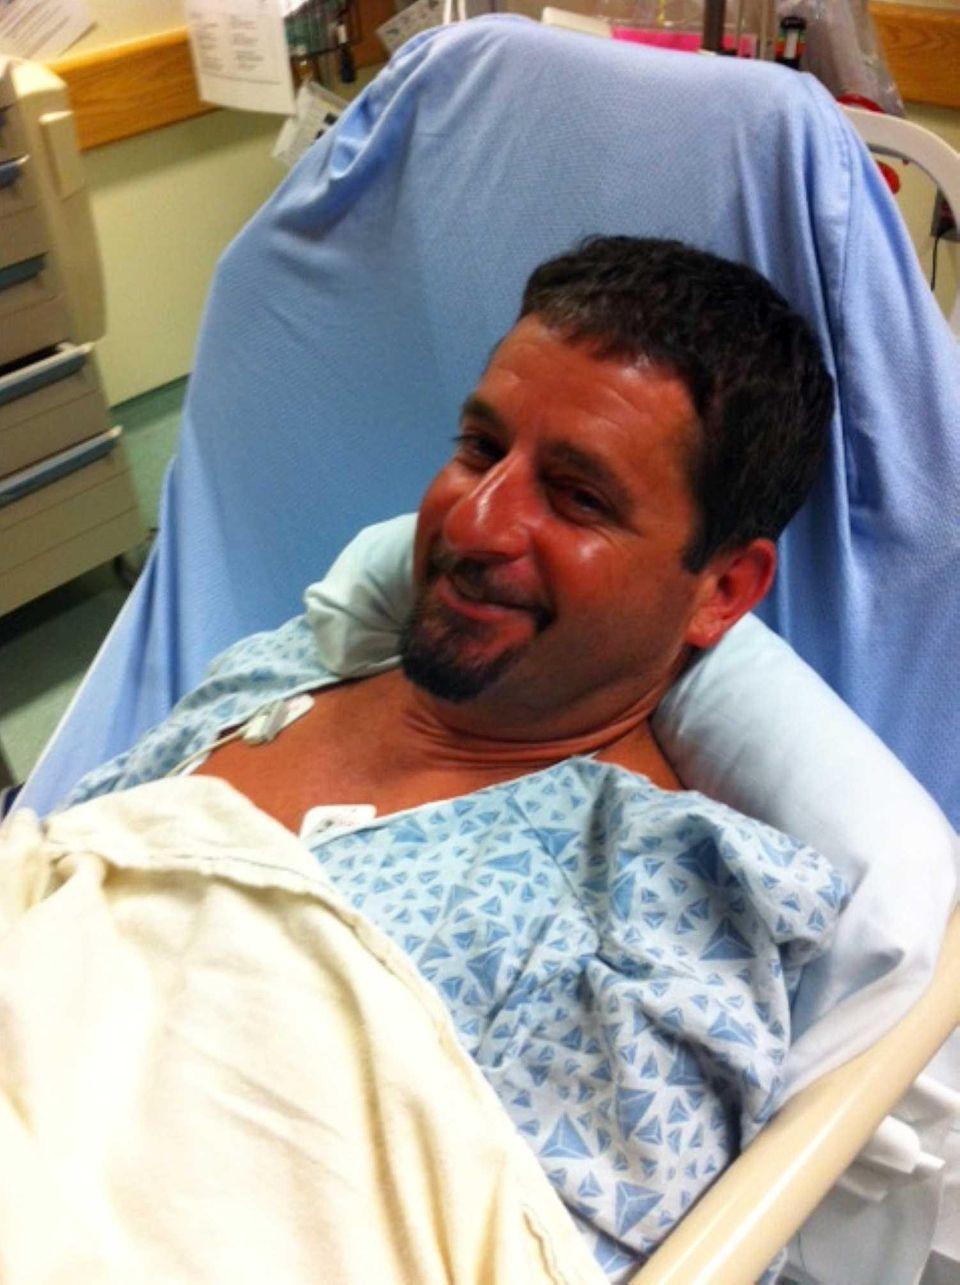 John Aldridge, a commercial fisherman from Montauk, recovers